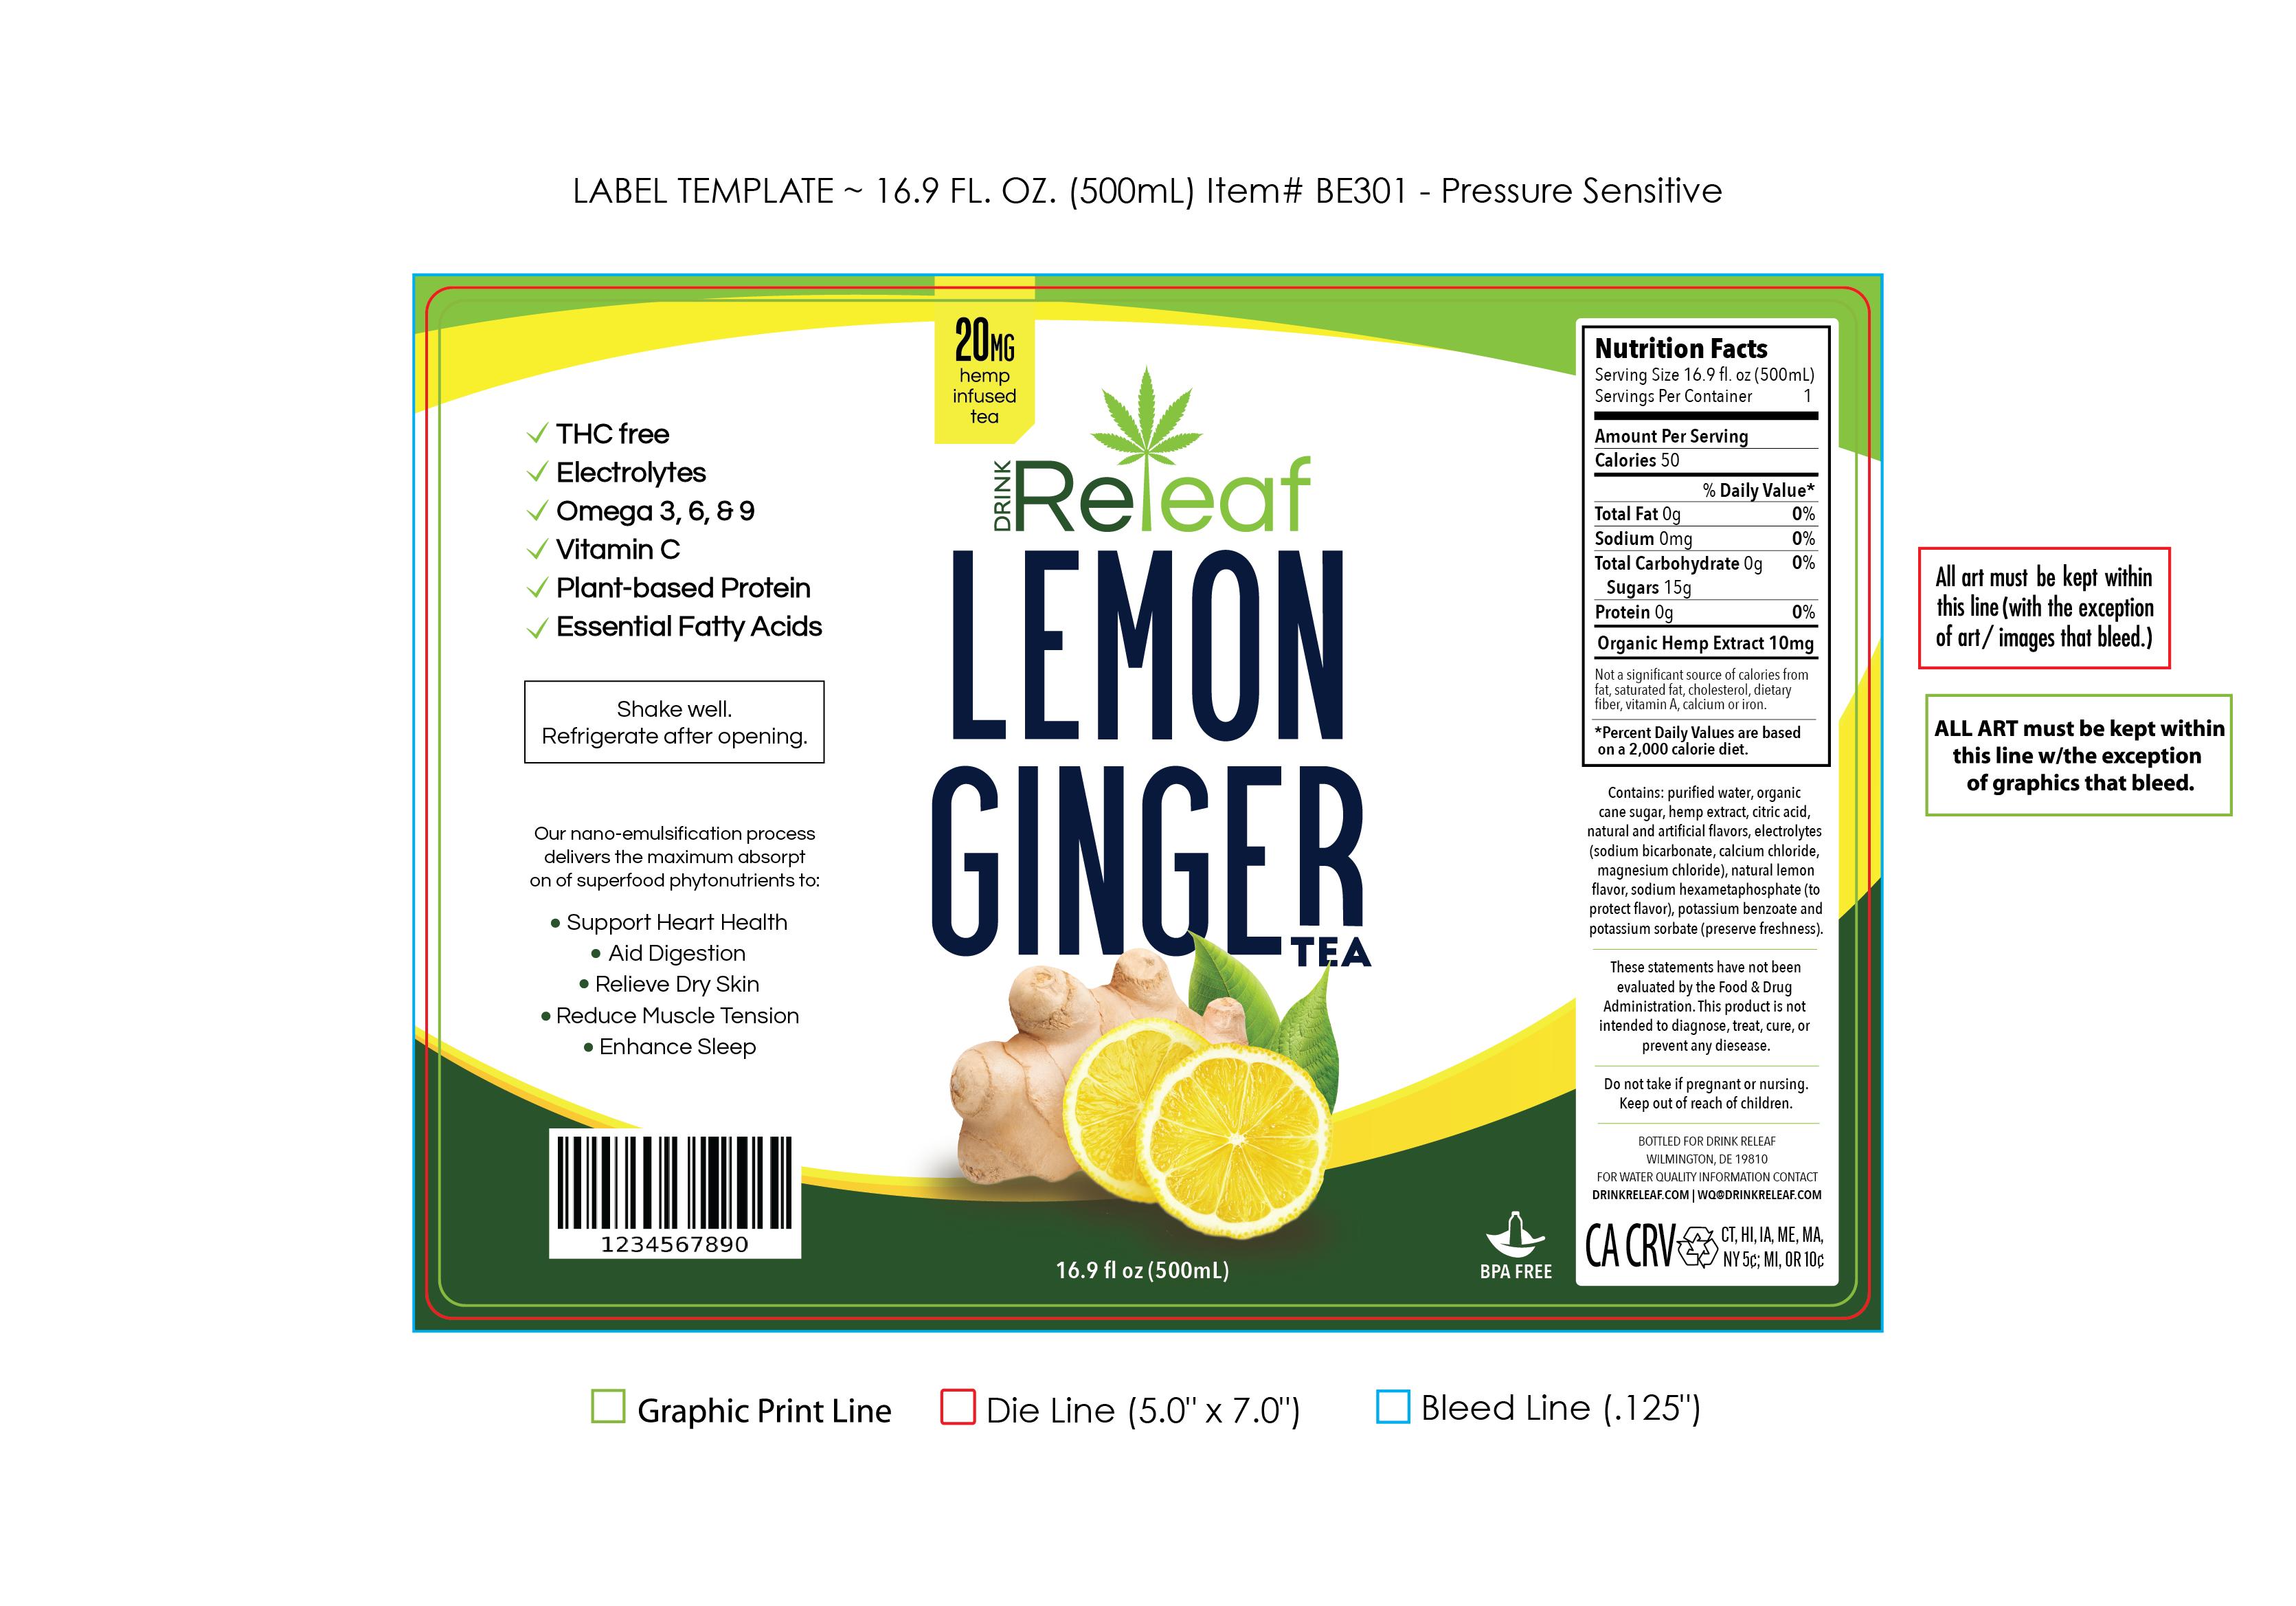 Premium hemp tea company looking for modern eye-catching design